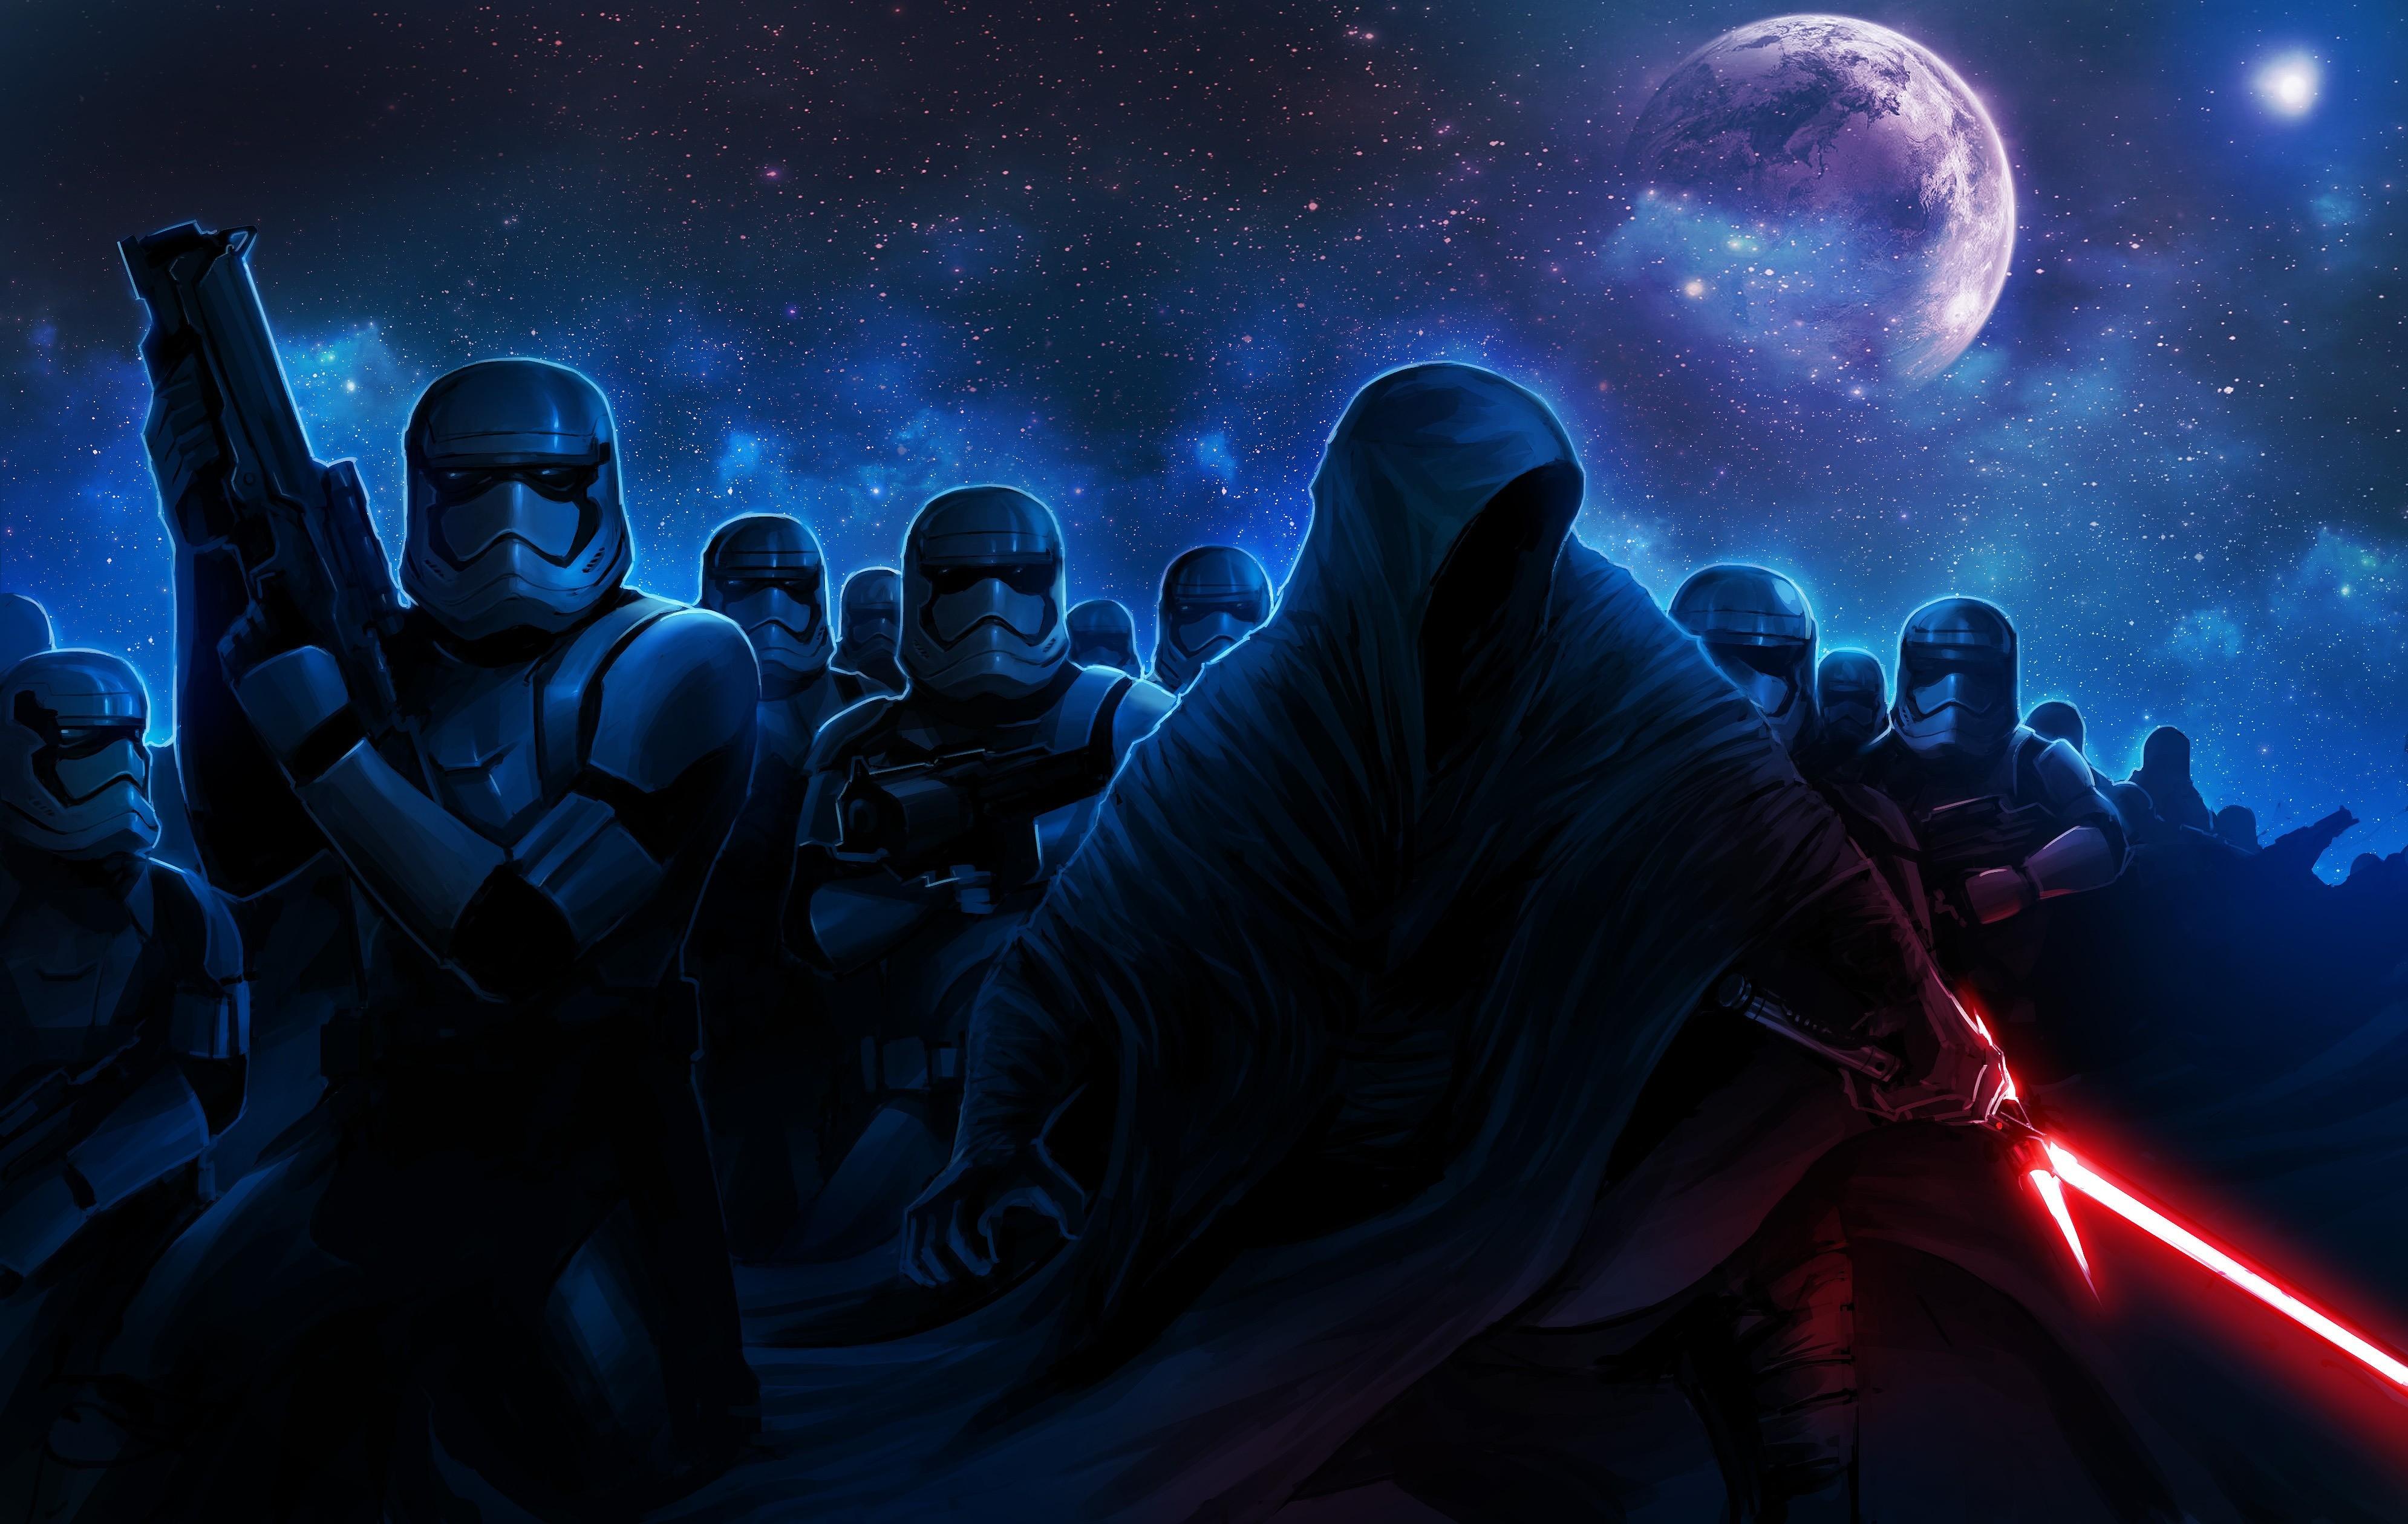 Wallpaper Star Wars Artwork Sith Science Fiction